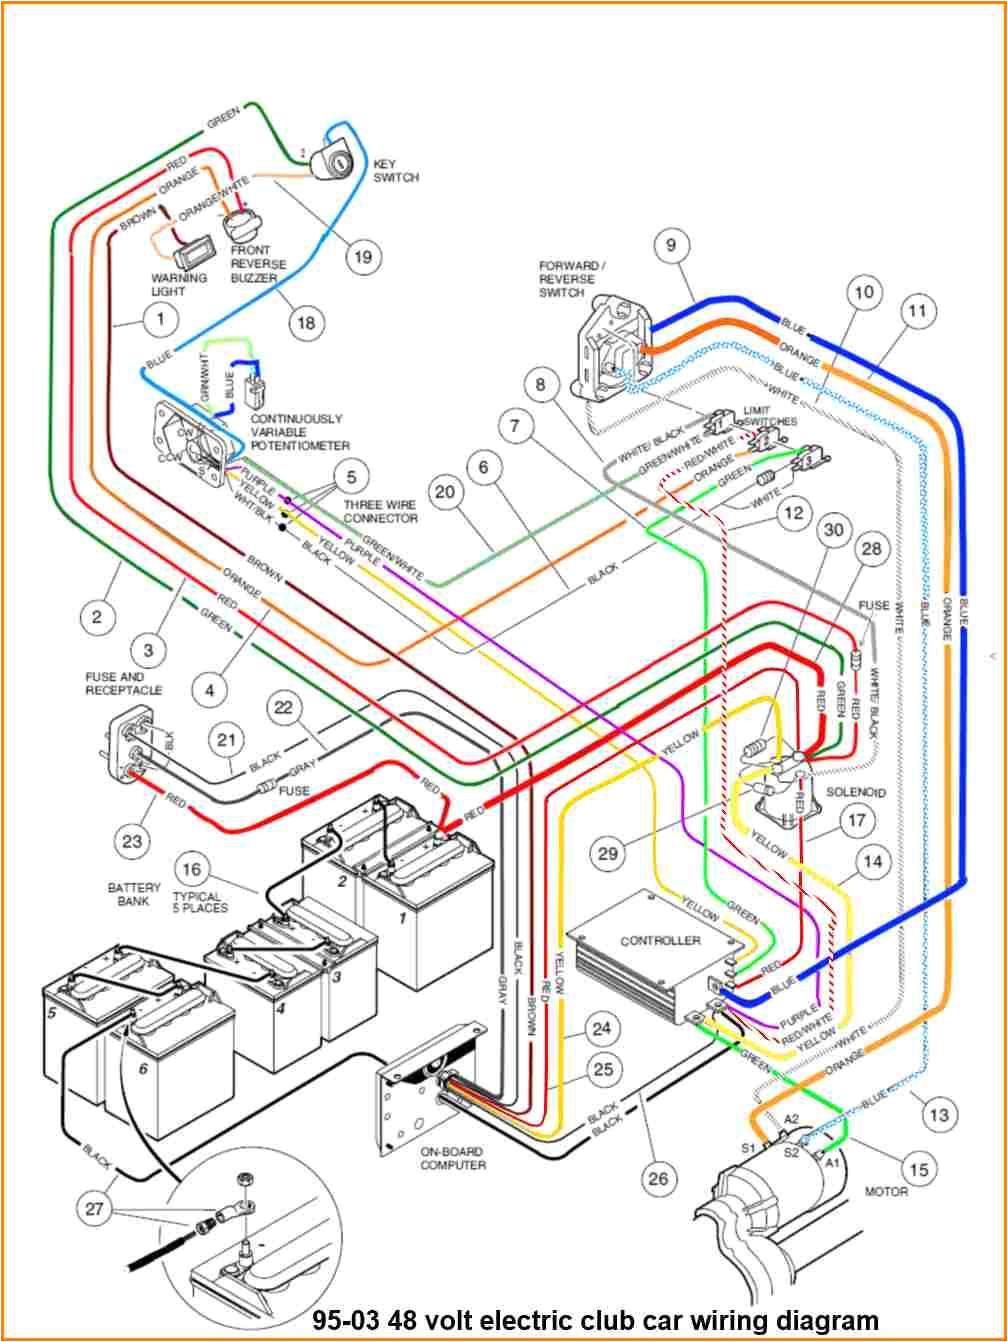 36 volt wiring color diagram wiring diagram post 36 volt western wiring diagram